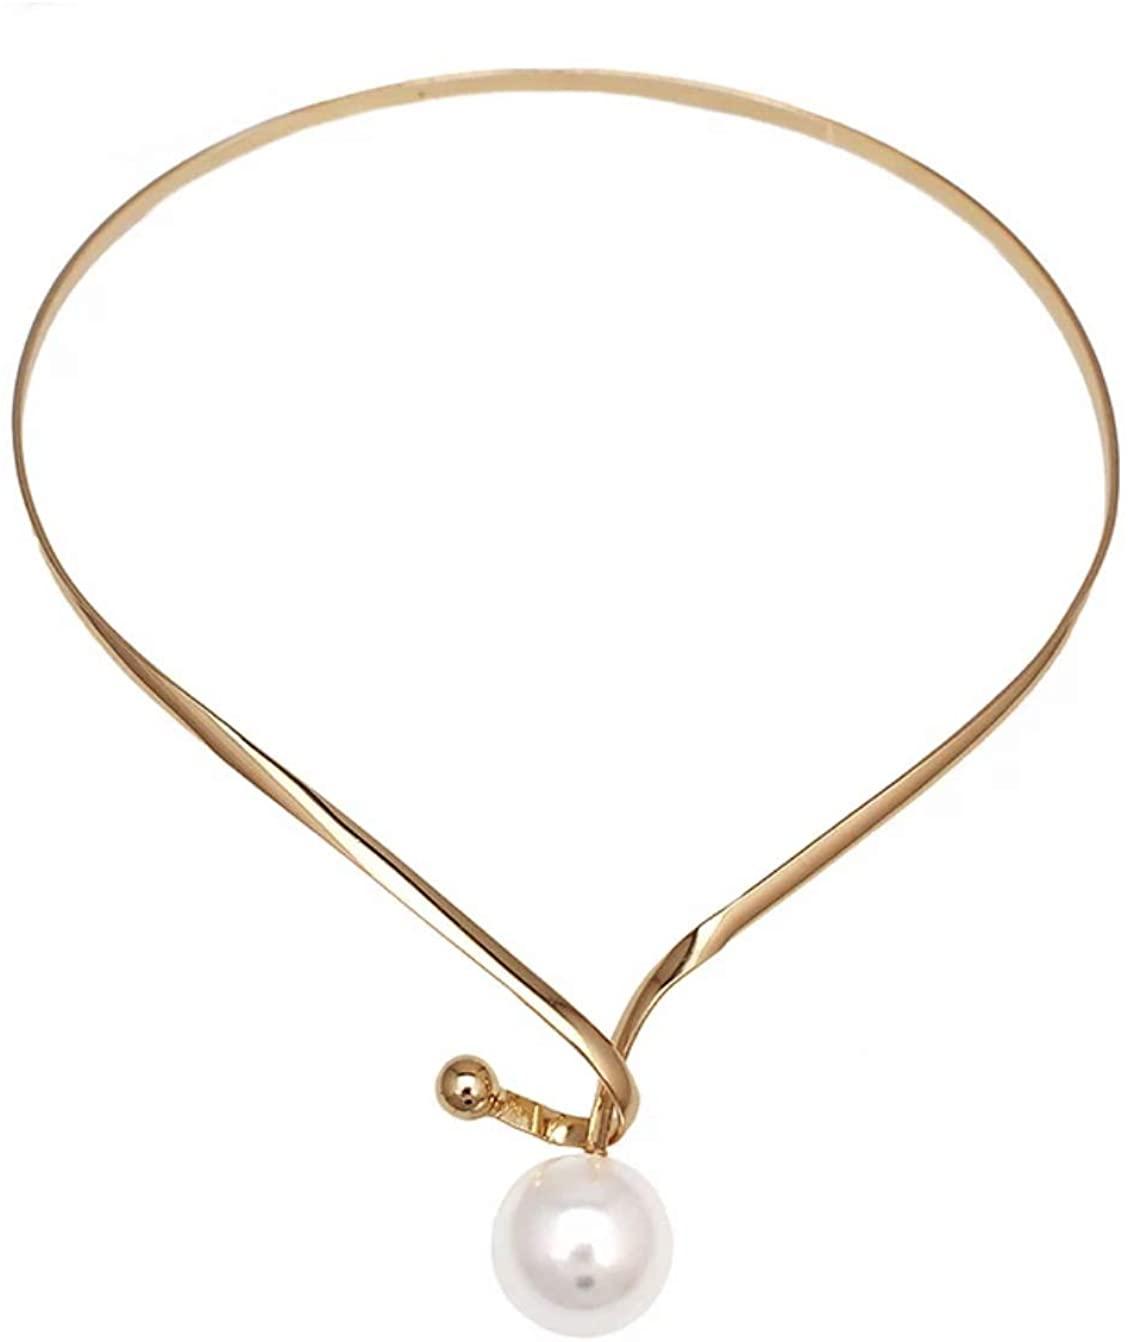 Nataliya Gold Torques Simulated Pearl Long Pendants Collar Choker Statement Necklace